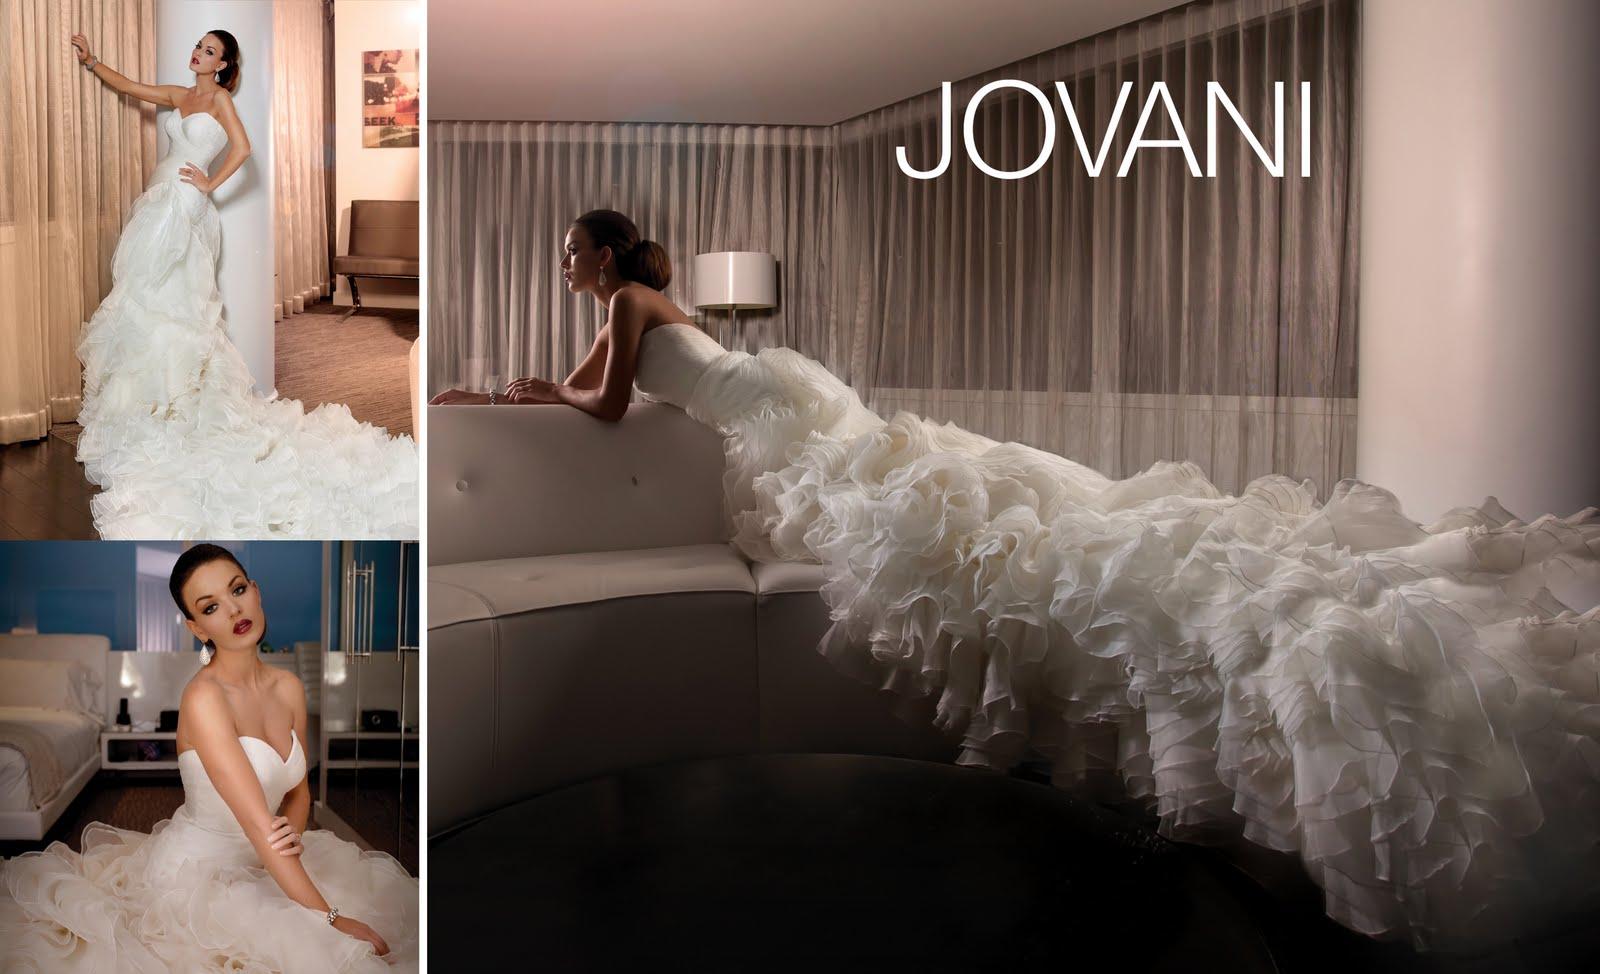 2 jovani wedding dress